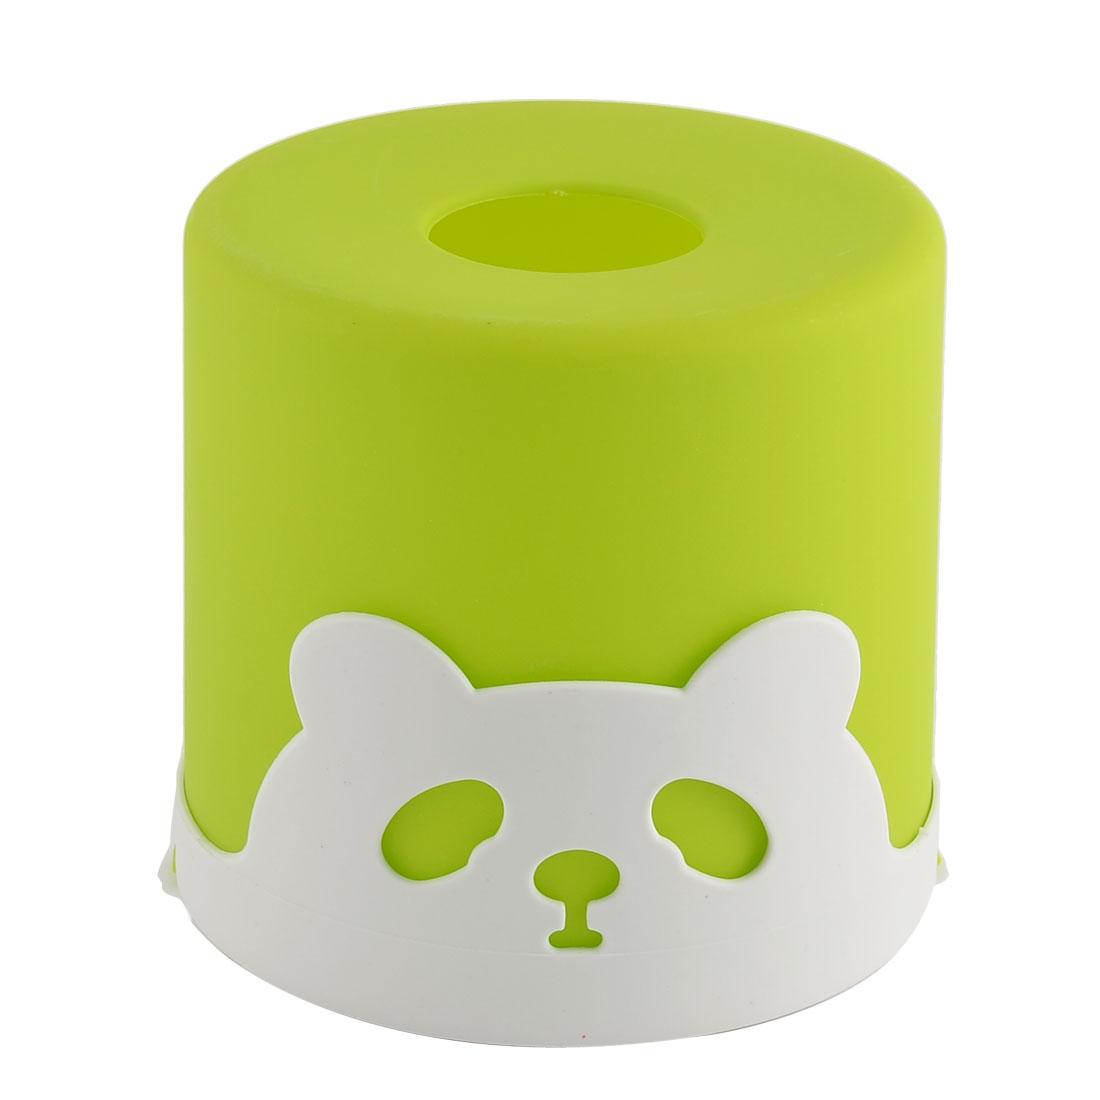 Household Car Plastic Round Panda Pattern Napkin Roll Tissue Paper Box Case Holder Cover Green